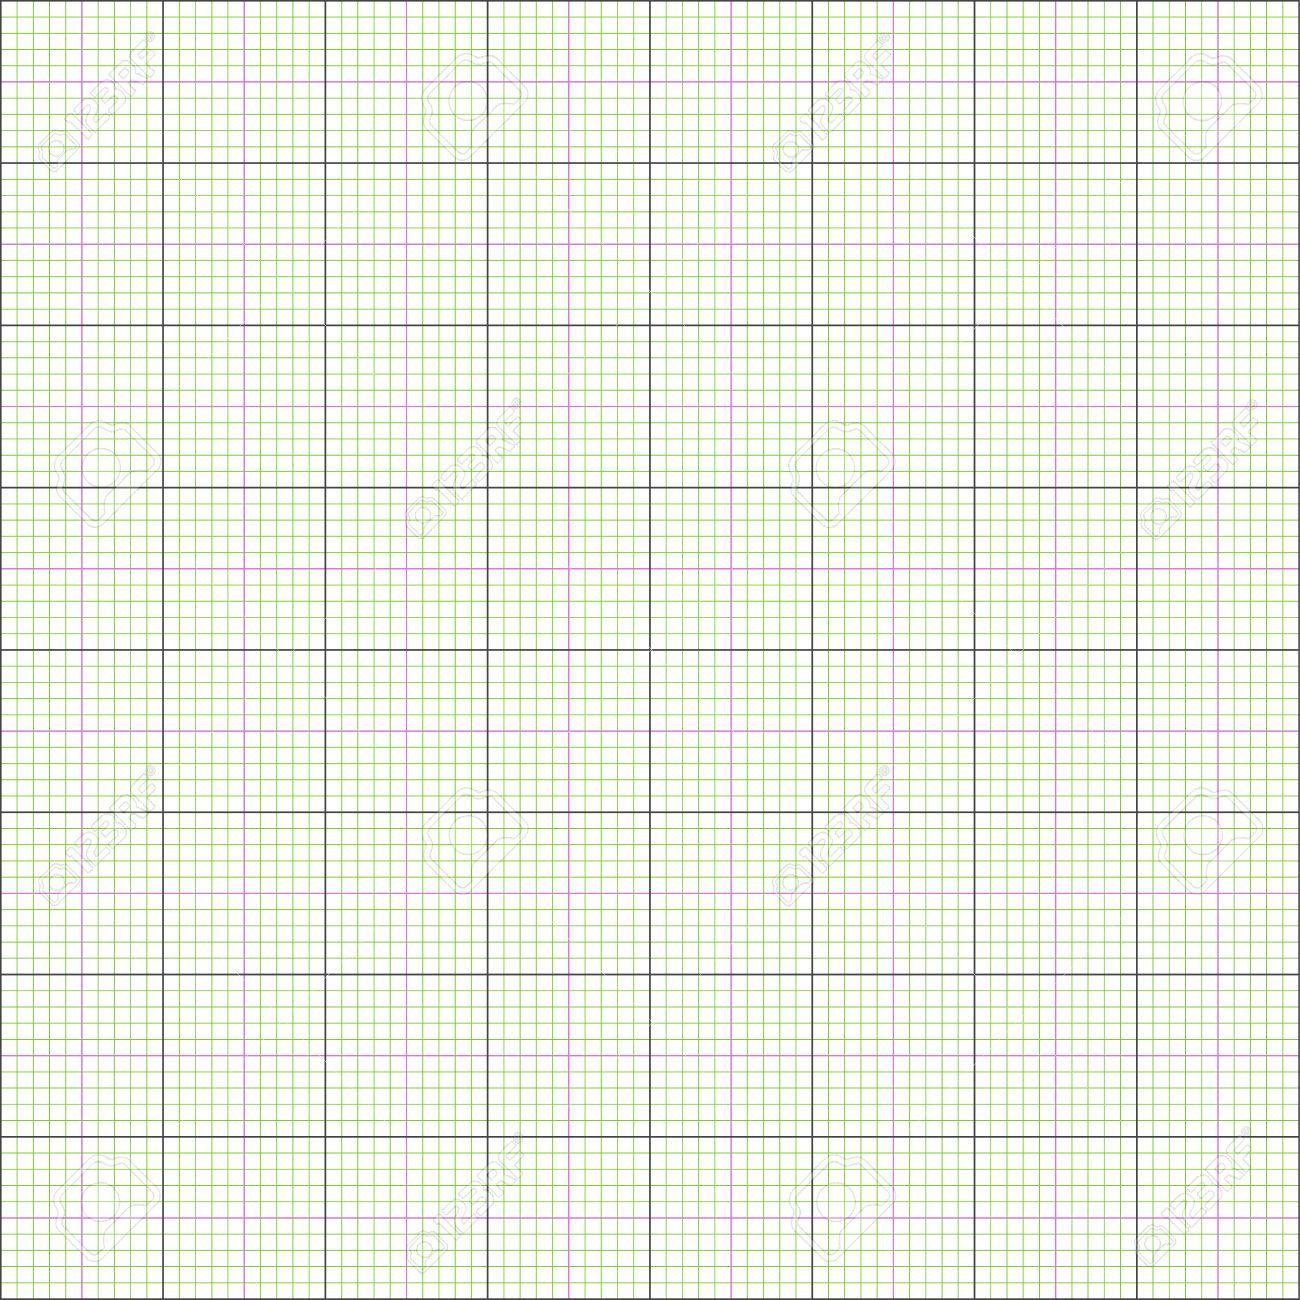 worksheet Print Free Graph Paper graph paper grid background 2d illustration vector eps 8 stock 33339042